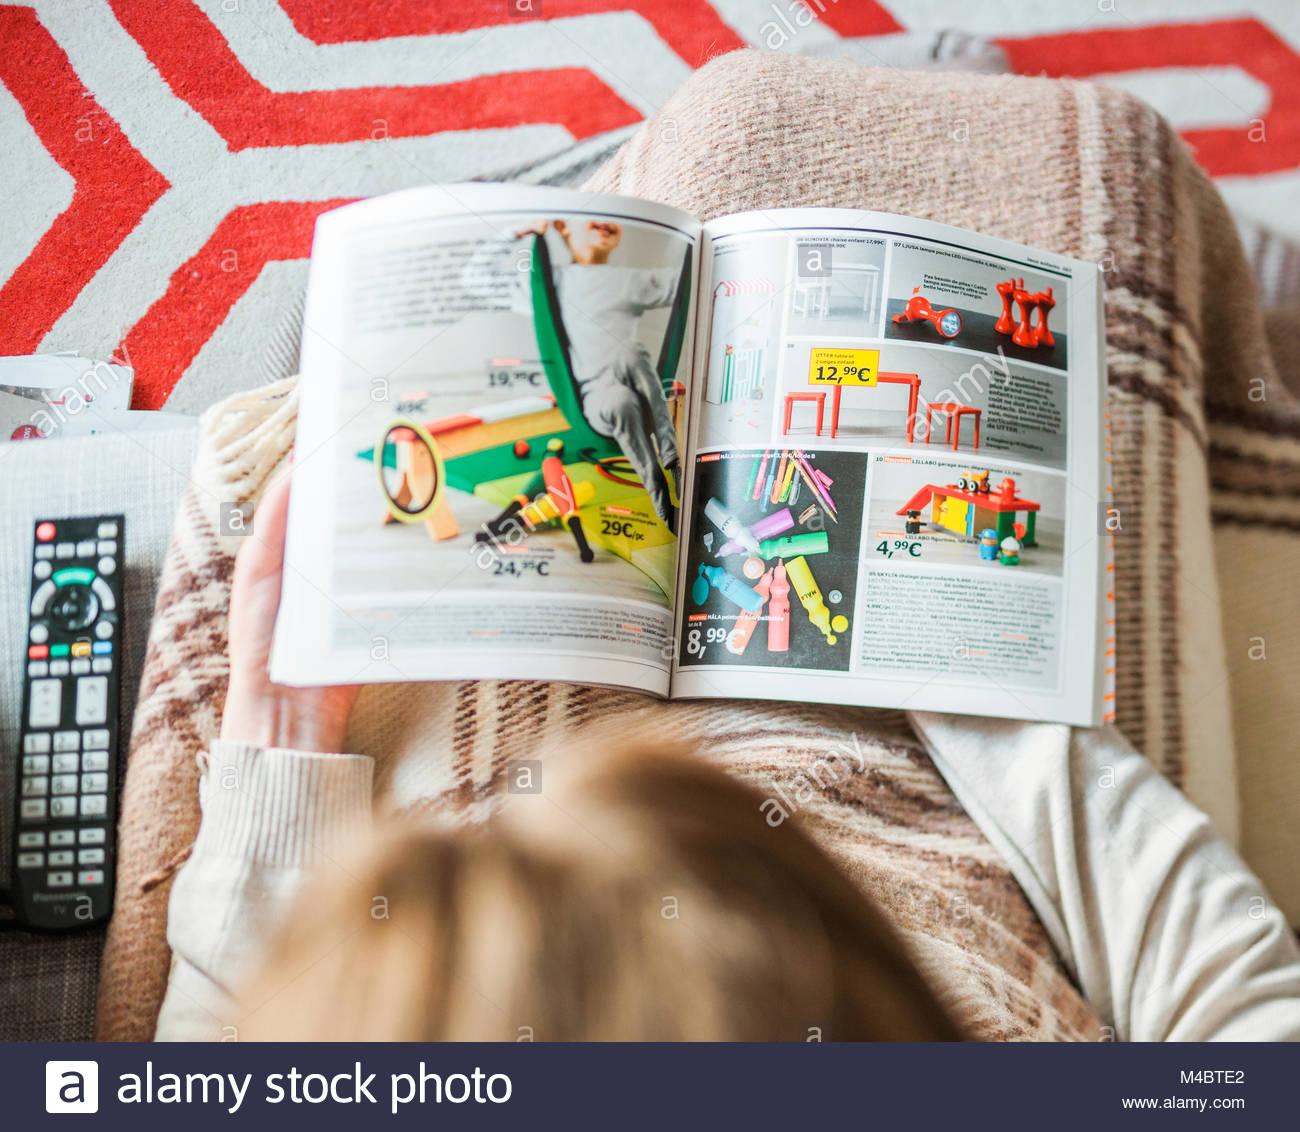 Woman reading IKEA catalog furnishing house kids furniture - Stock Image